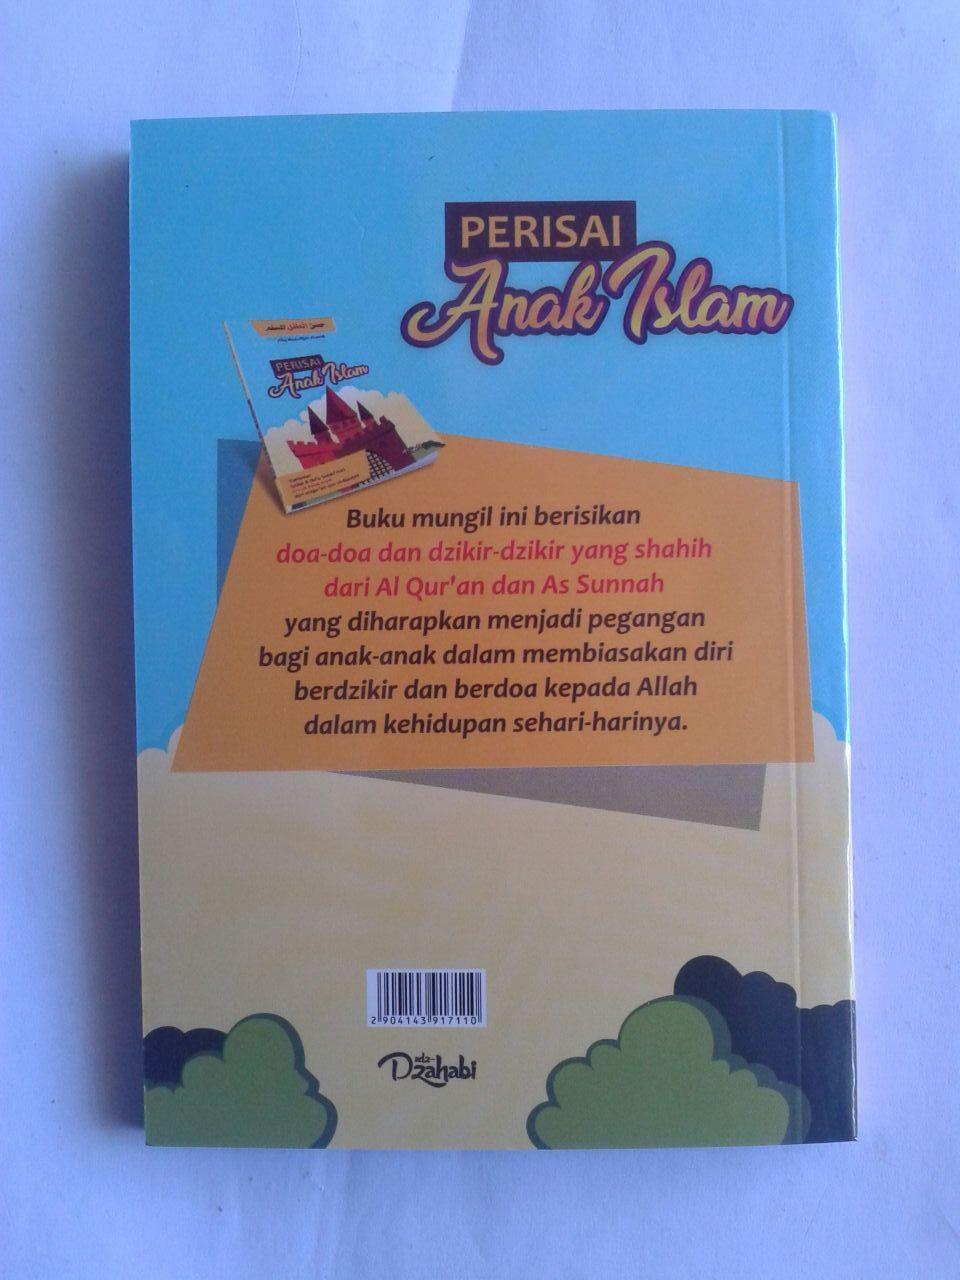 Buku Saku Perisai Anak Islam cover 2